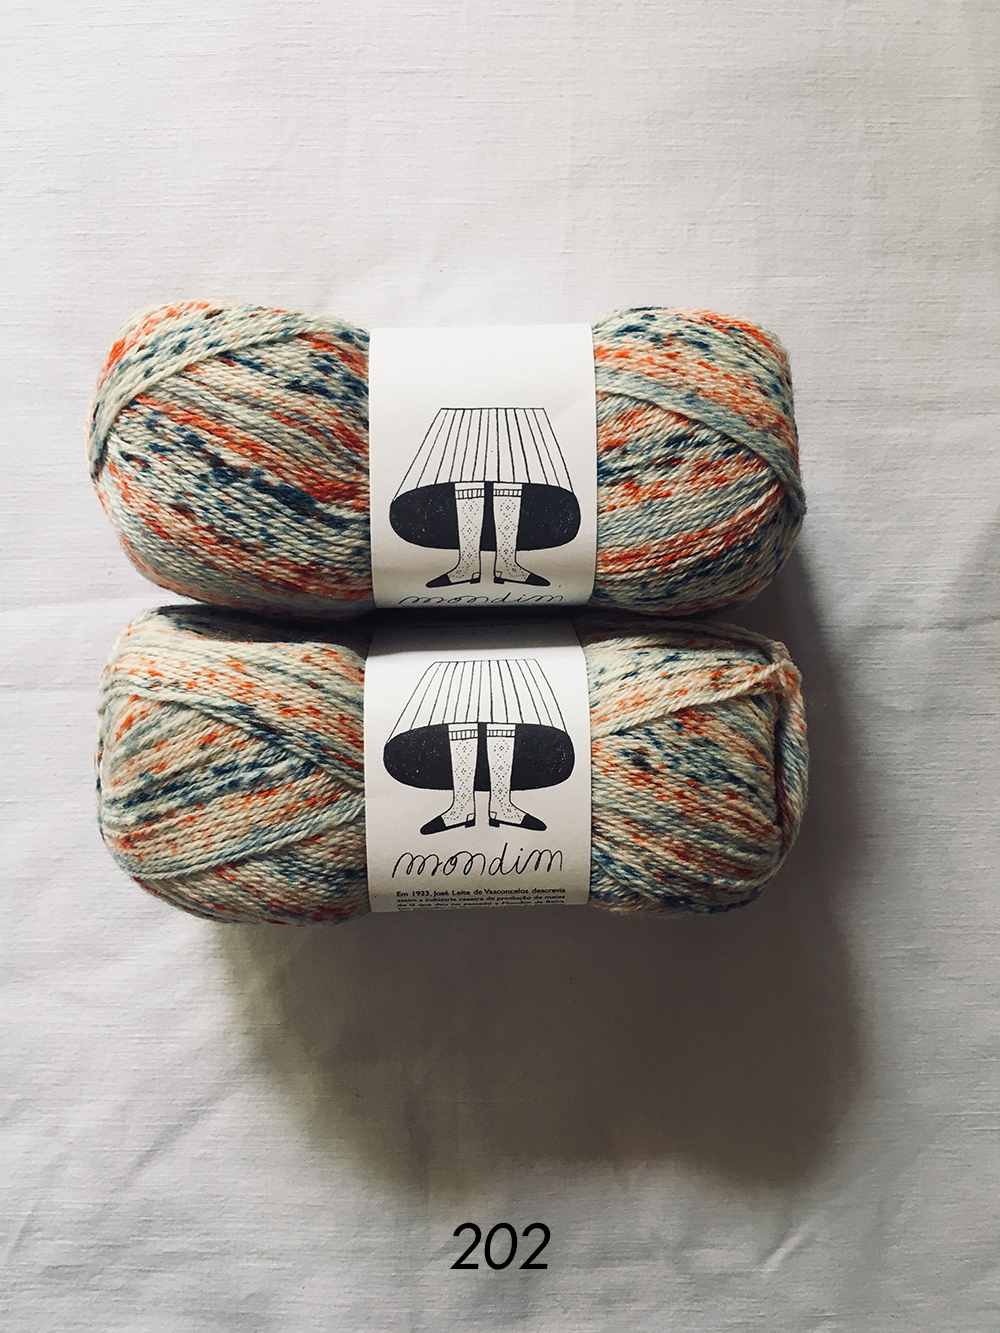 retrosaria_mondim_202_wool_done_knitting.jpg